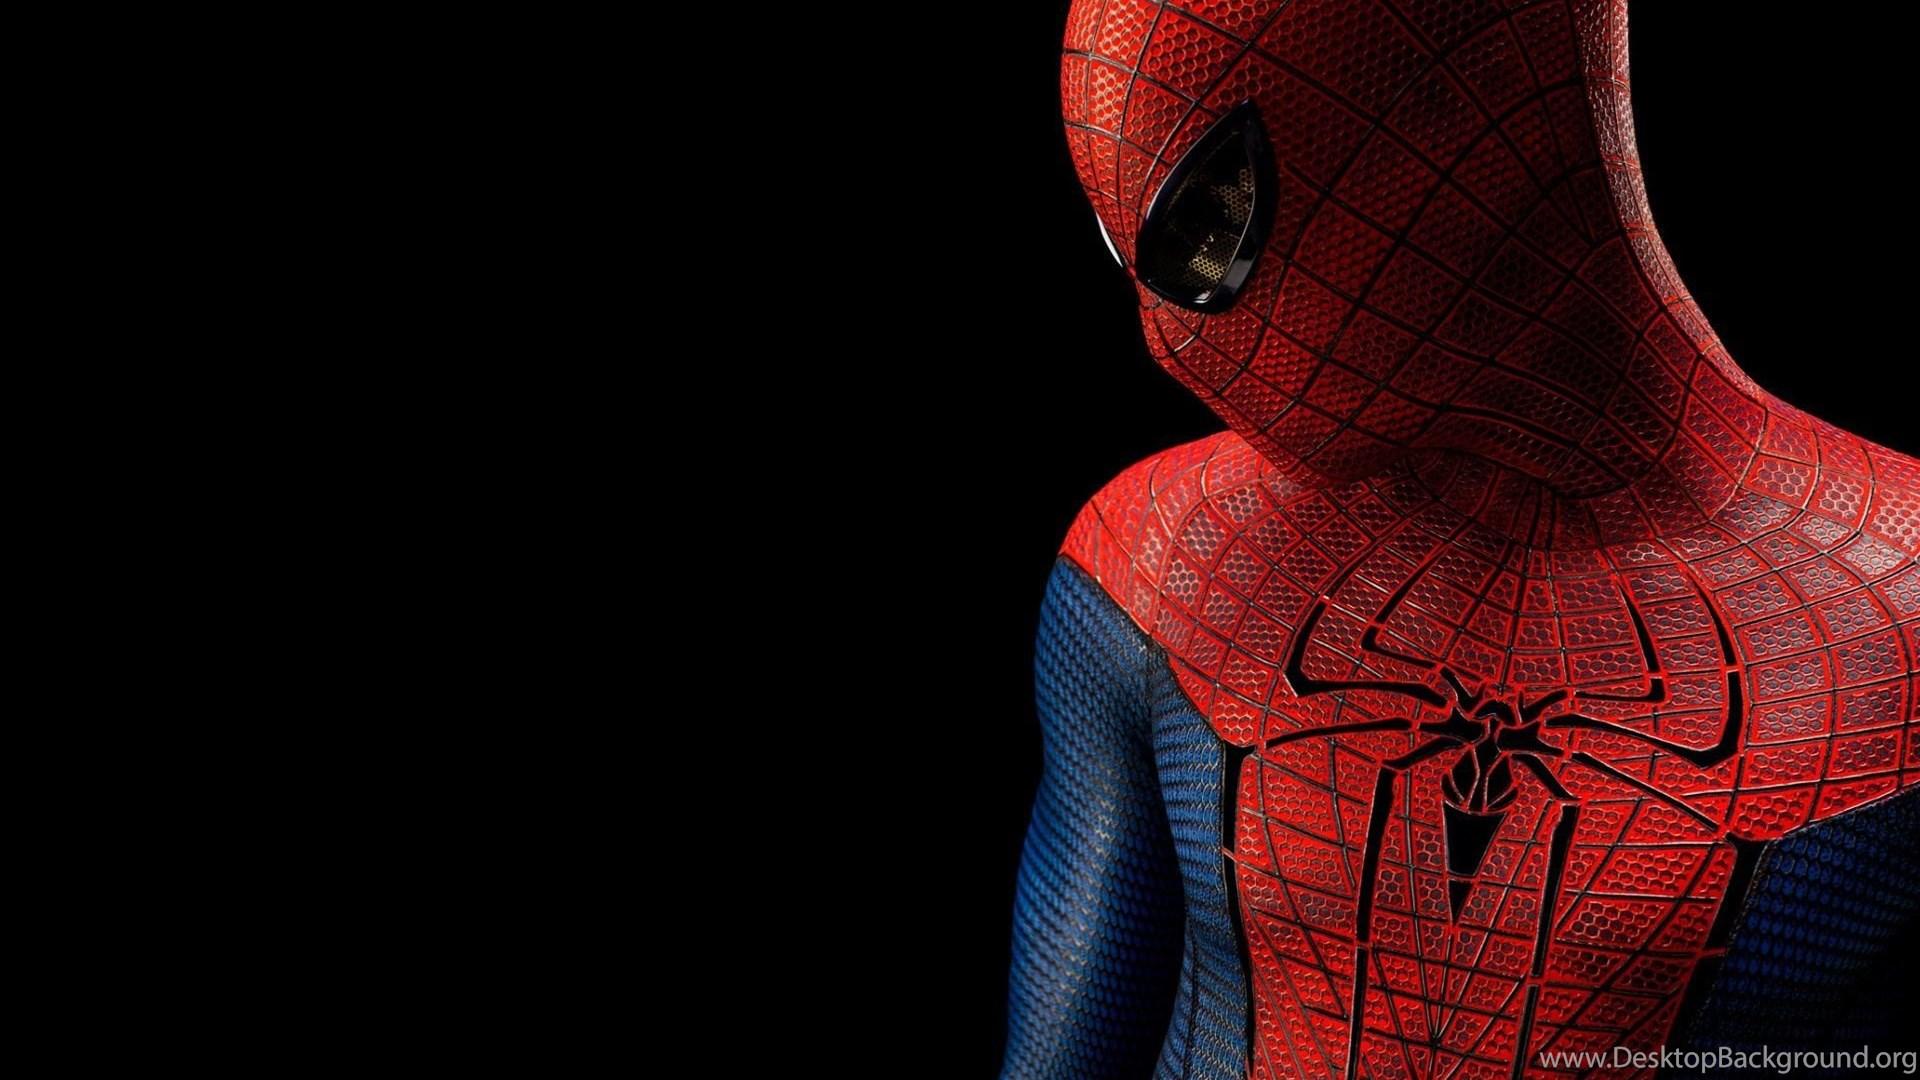 90 Amazing Spider Man Wallpaper 1920x1080 Wallpaper The Amazing